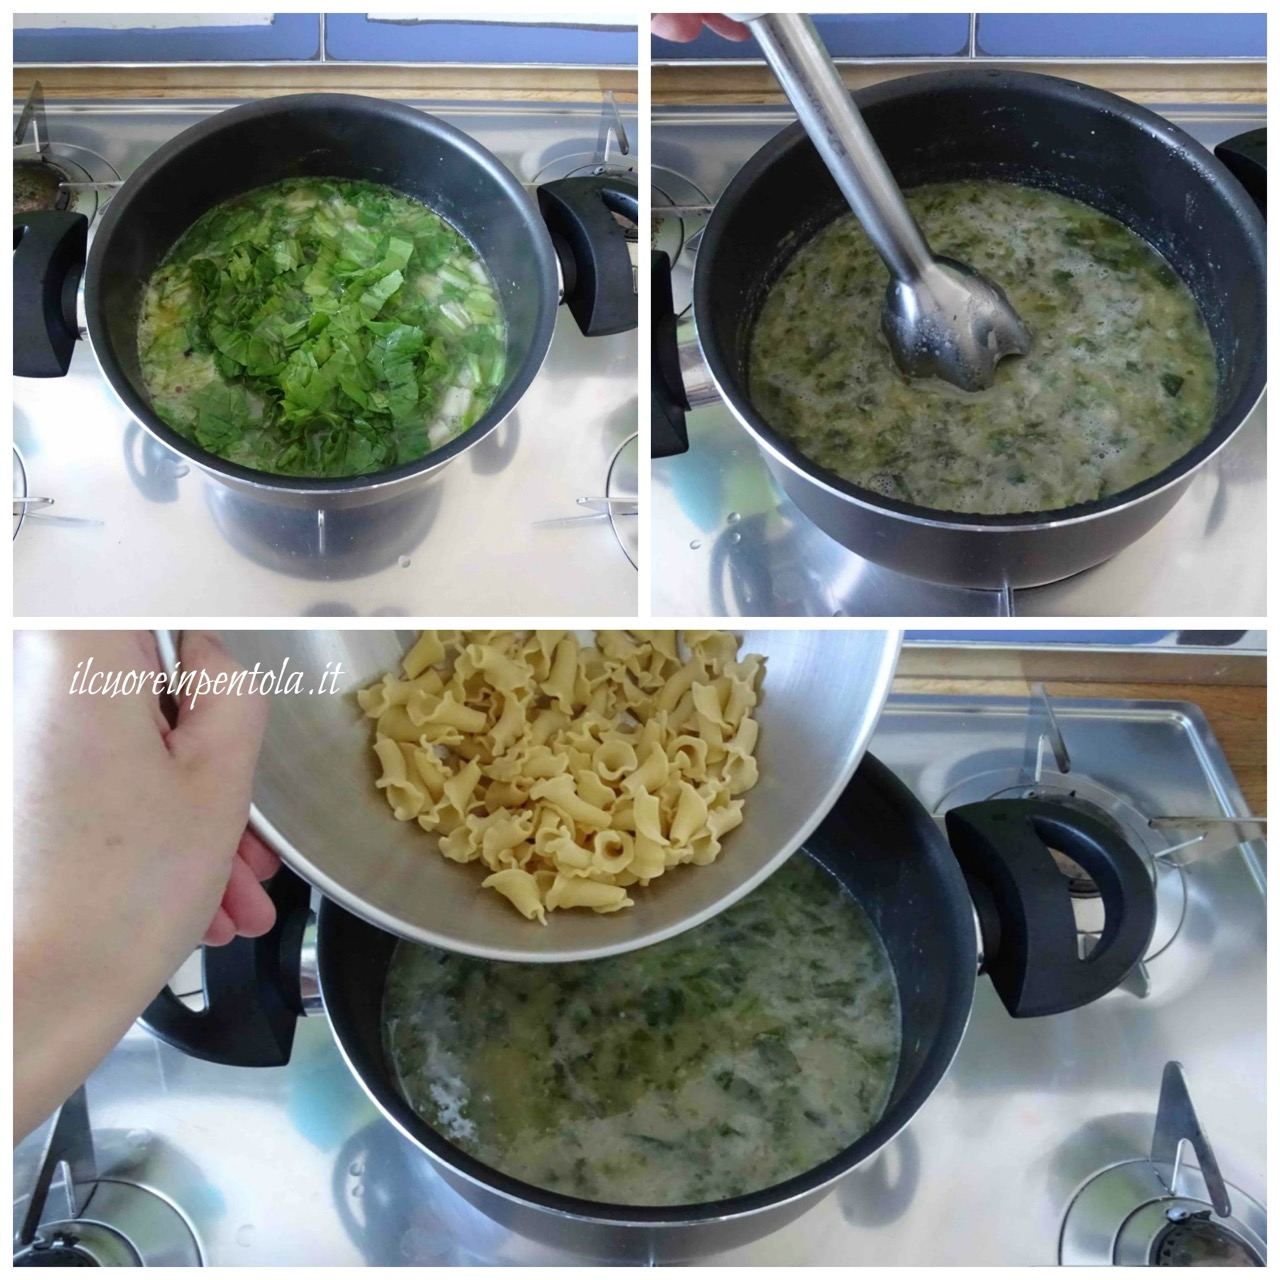 aggiungere verdura